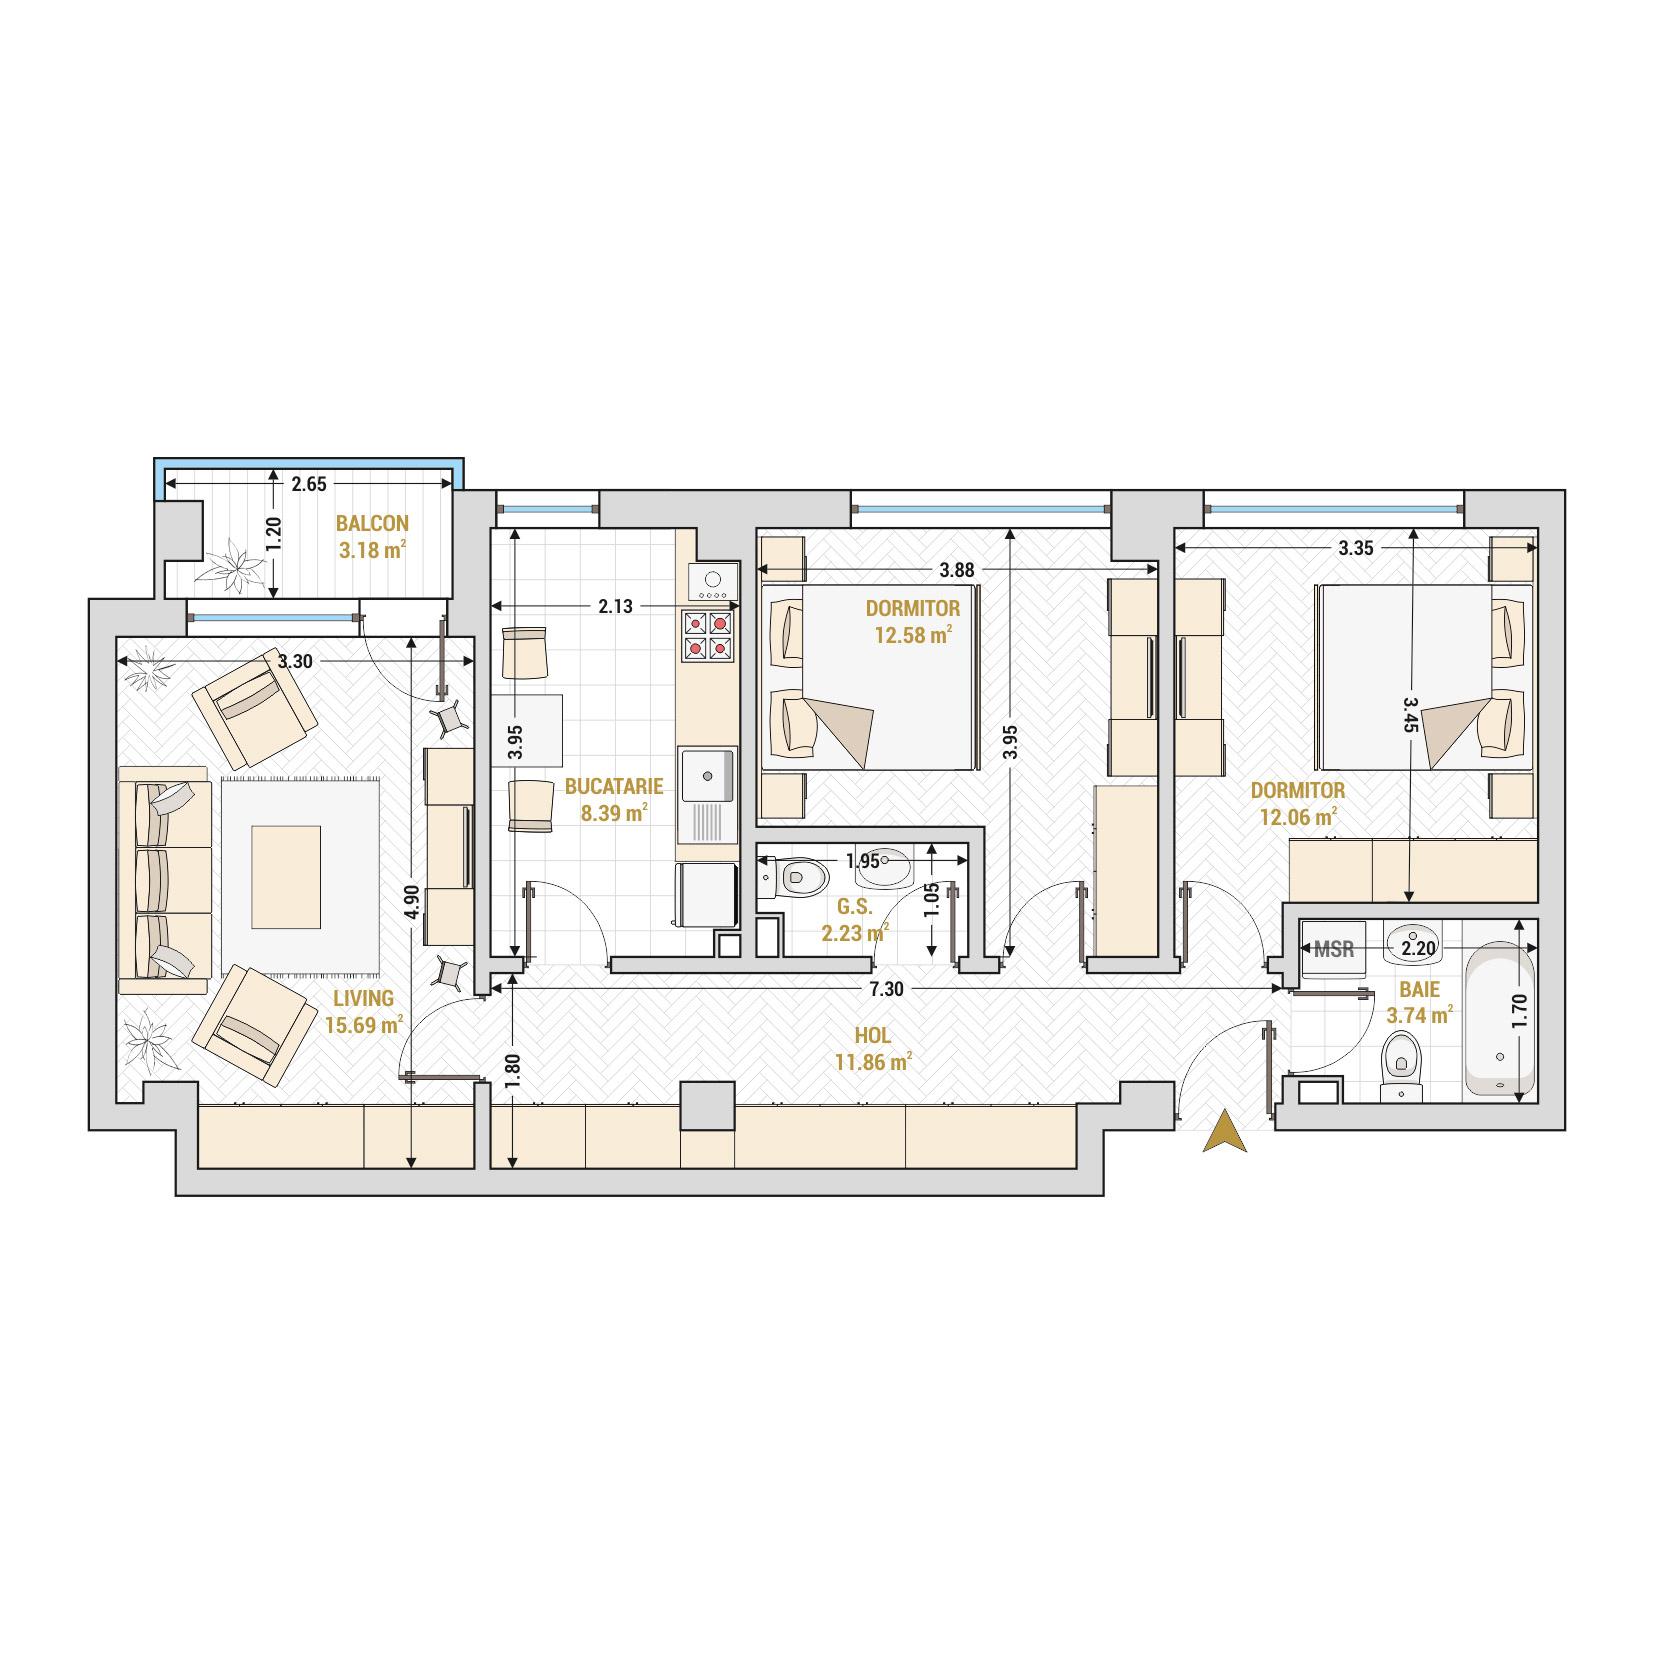 Apartament 3 camere de vanzare Bucuresti - Catedral Residence - Marriott, Piata Unirii, 13 Septembrie, Izvor - Tip 2 - T2A